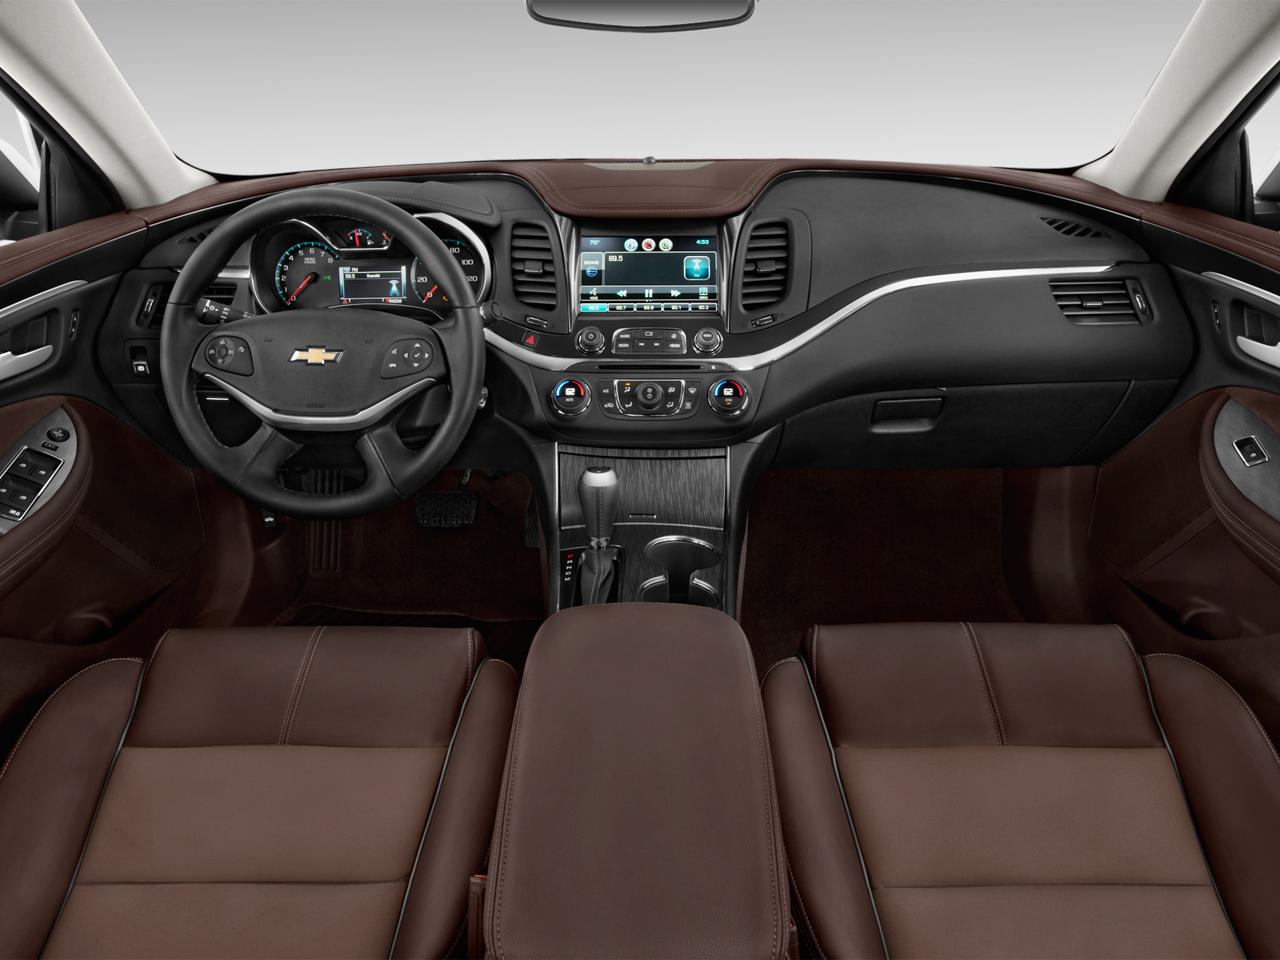 2016 Chevrolet Impala Dashboard Interior